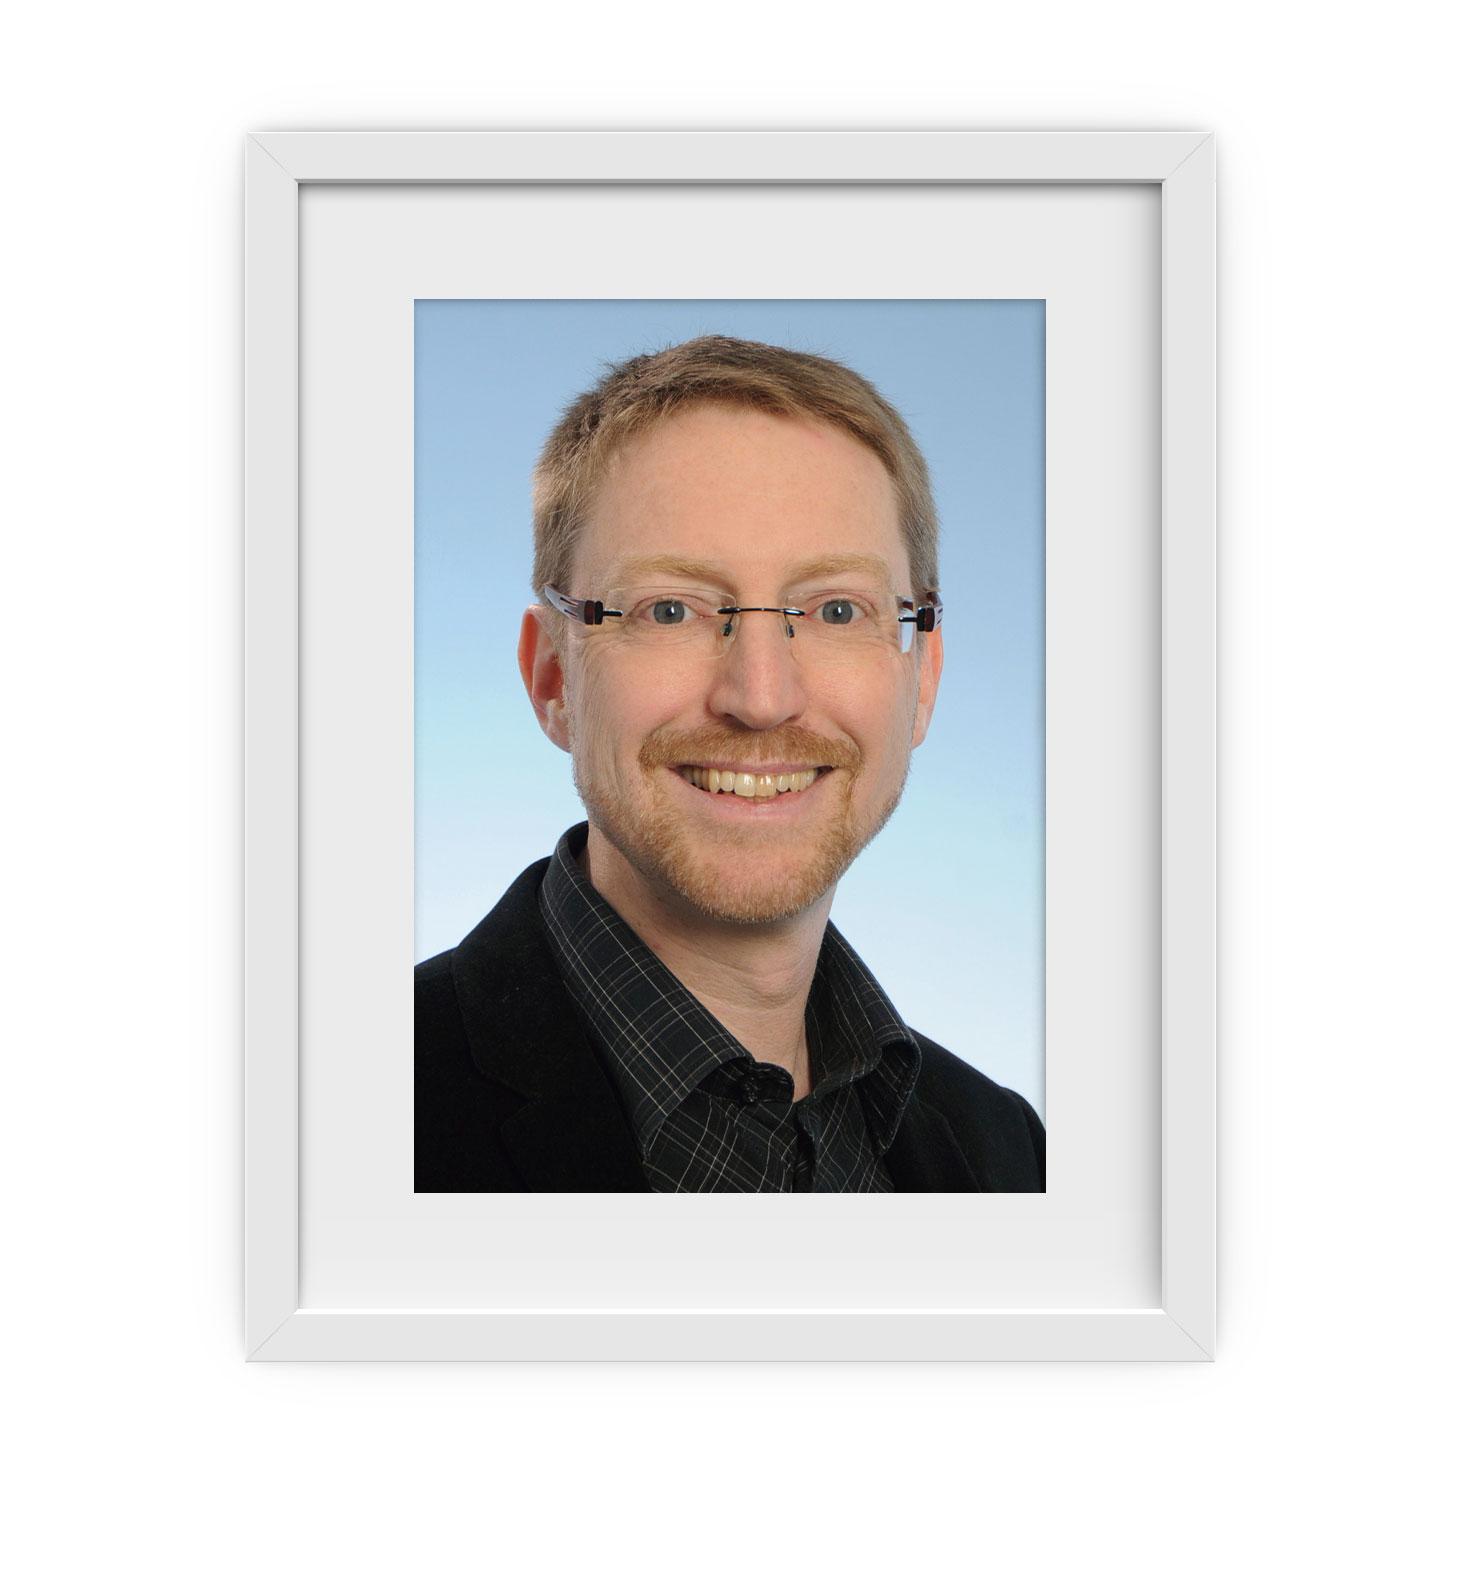 Portrait Ralf Halk